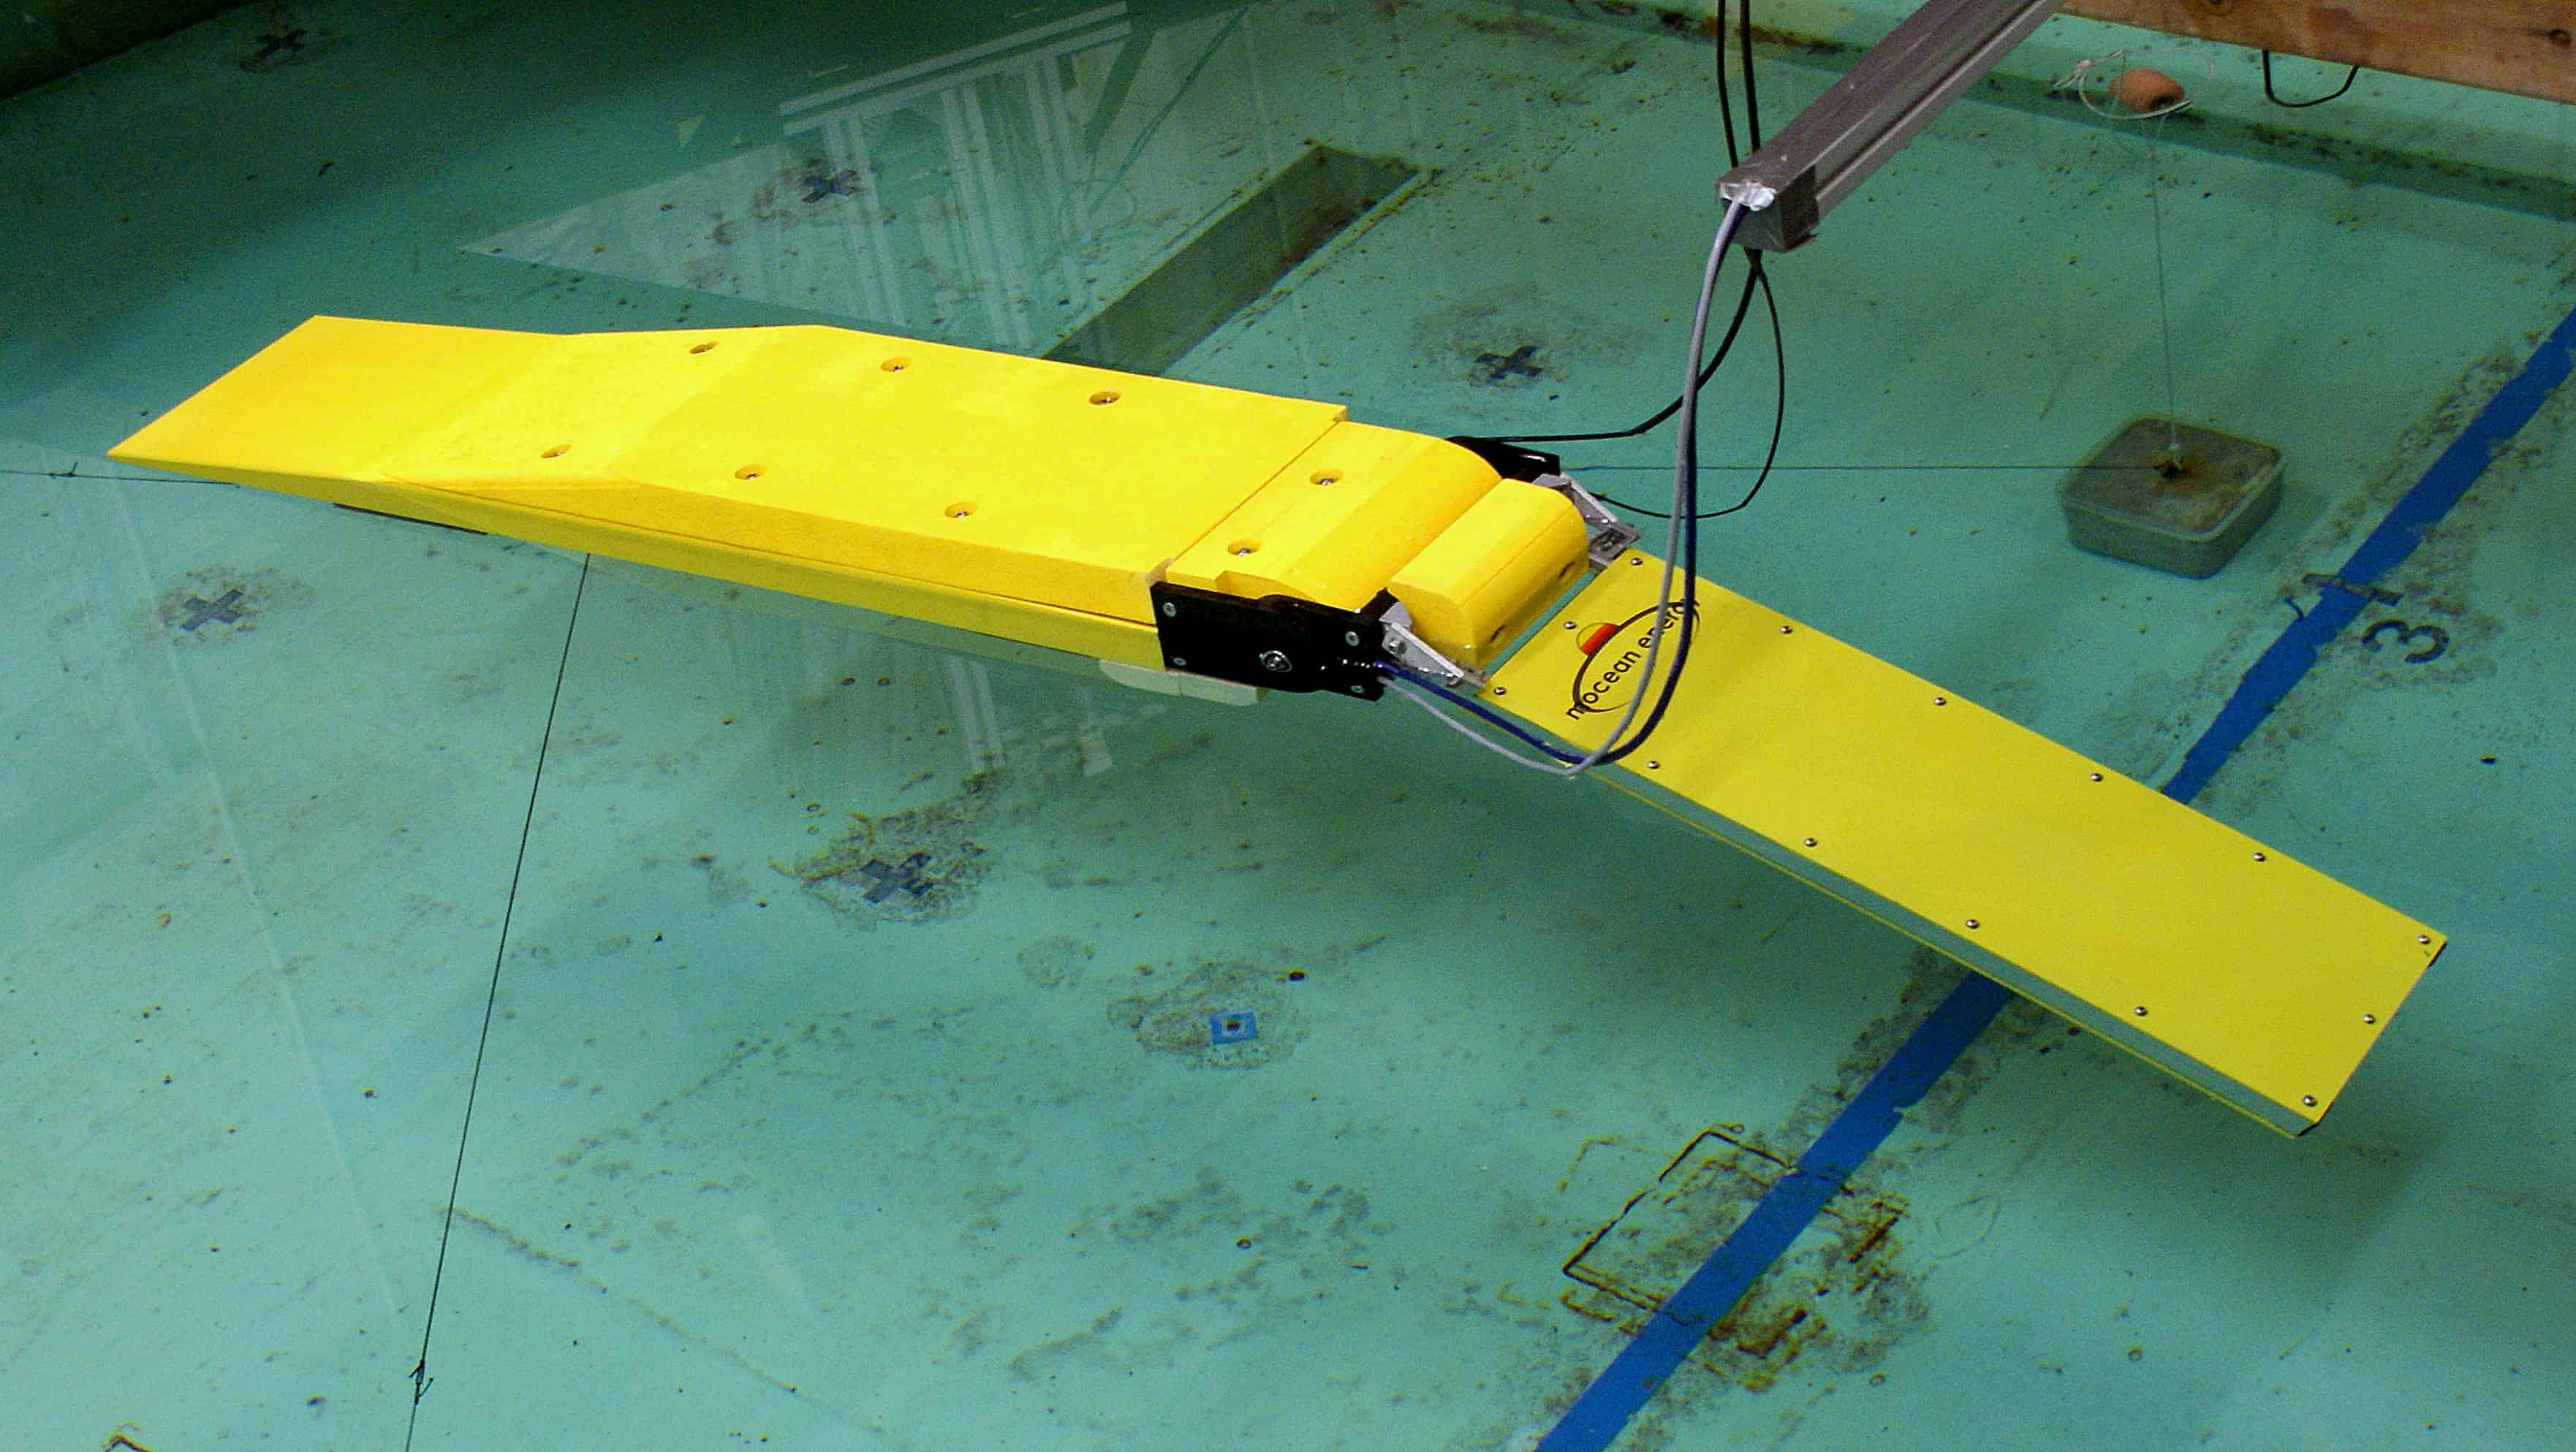 Miniature reaction torque sensor